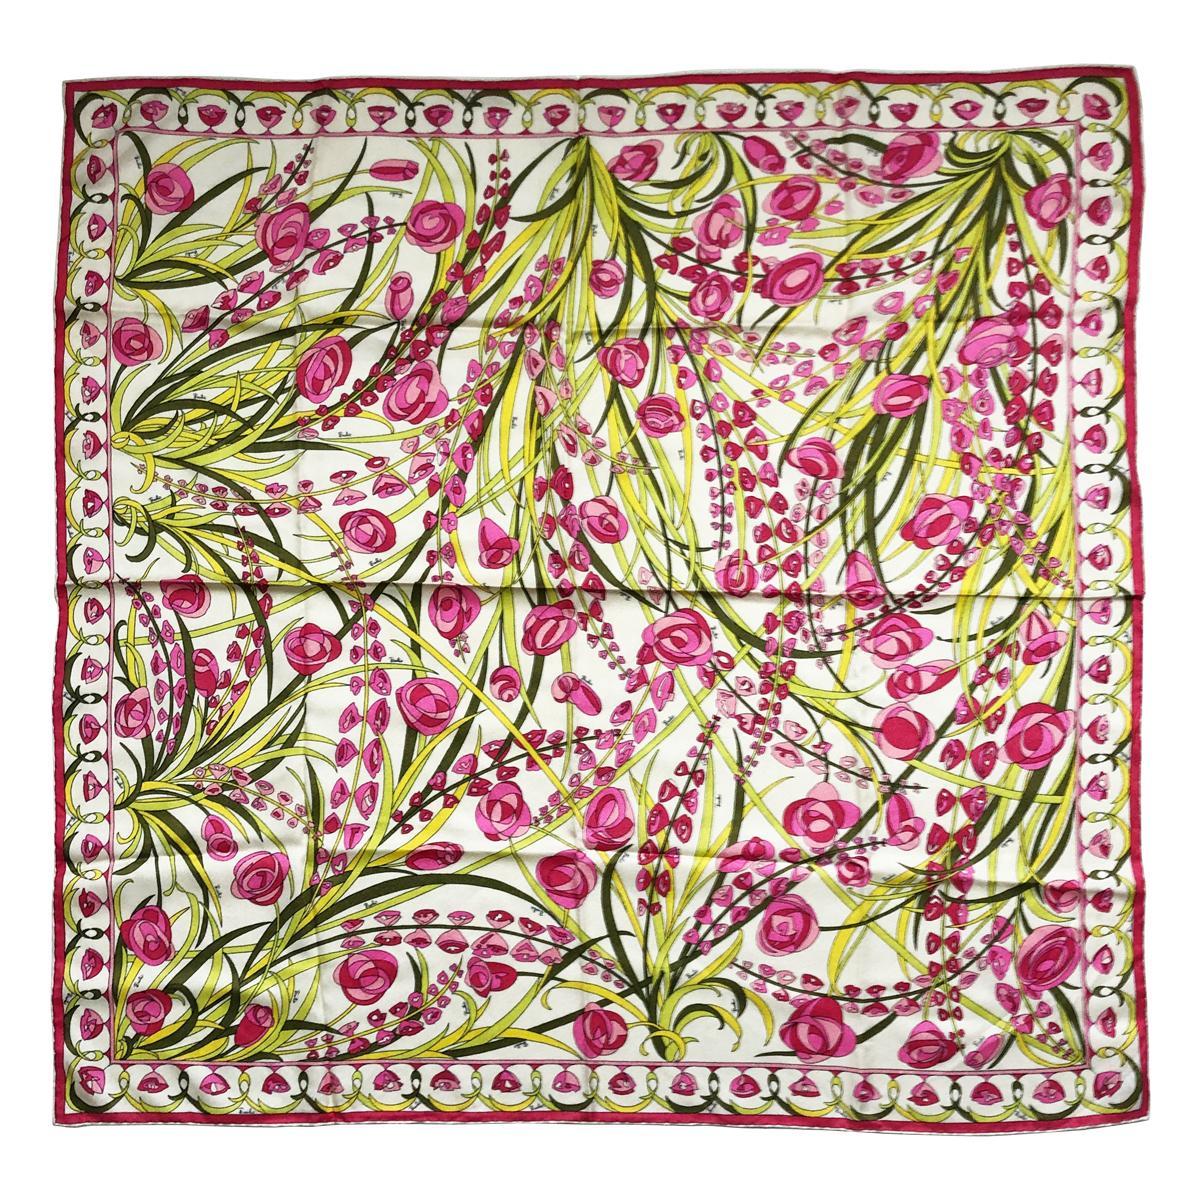 Emilio Pucci Silk Scarf Shawl 34in Vintage 70s Pink Florals